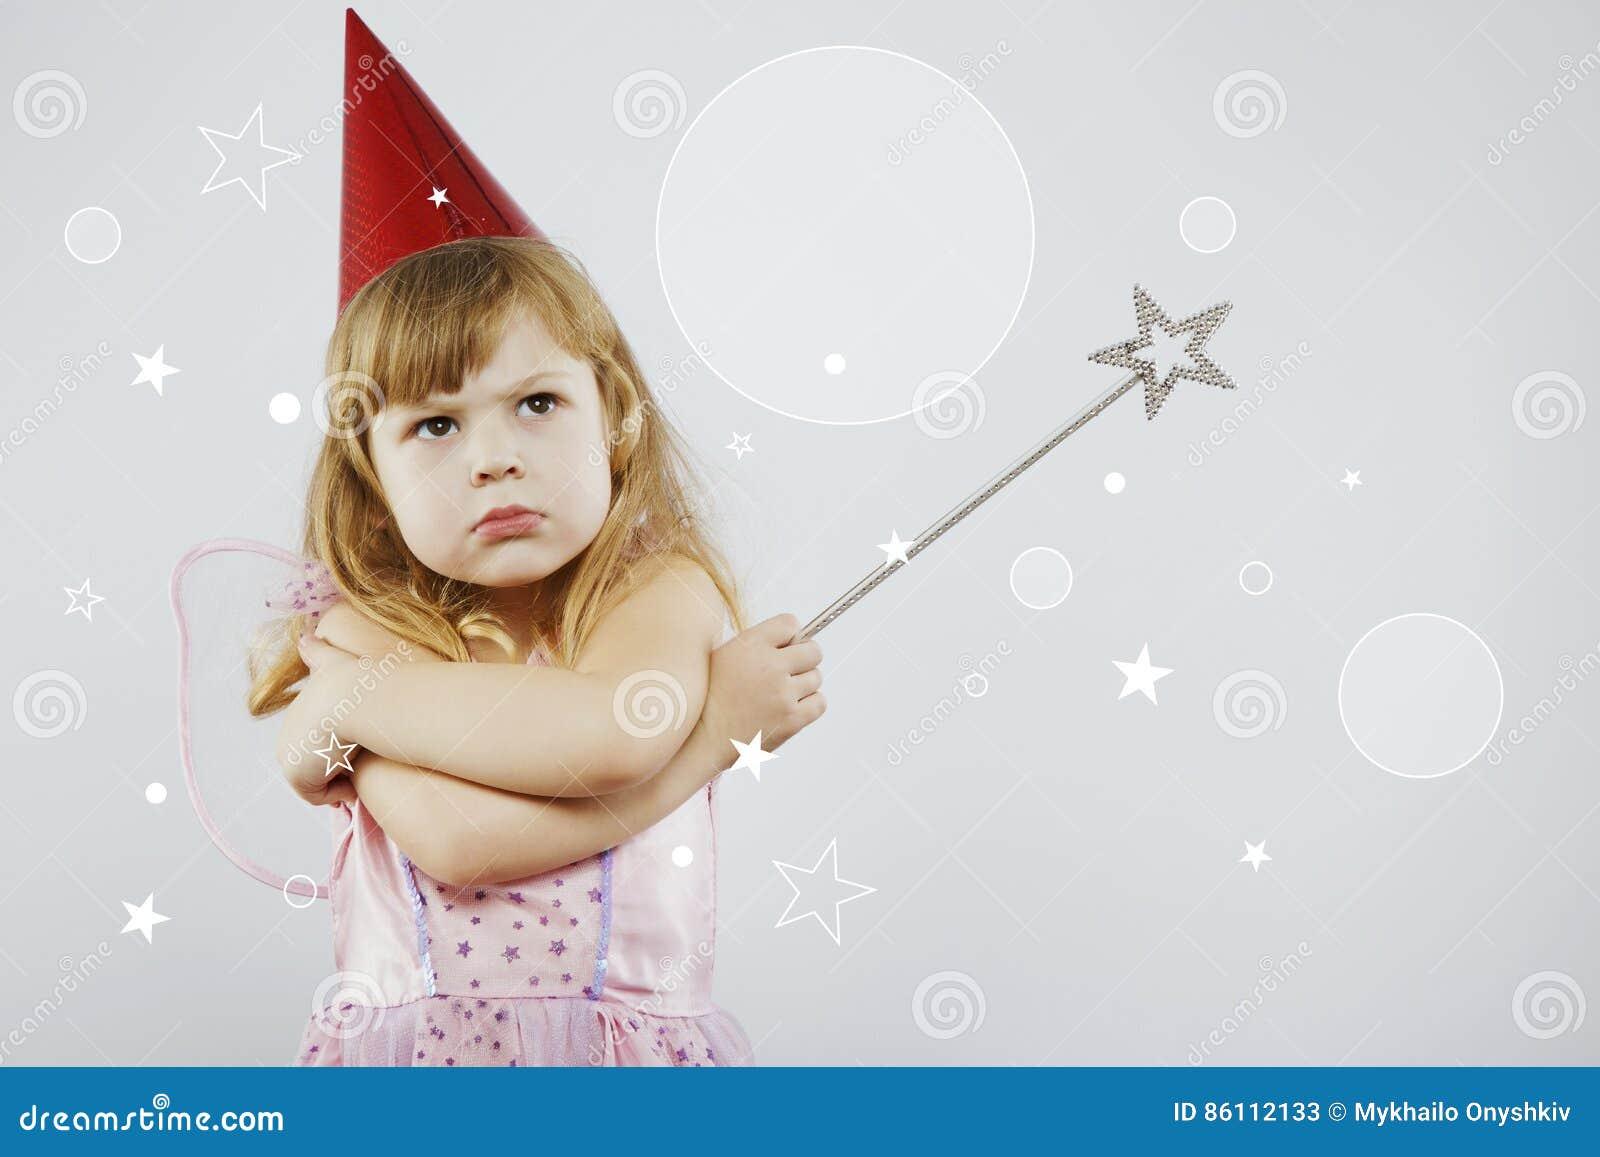 00087b61e Upset Girl Posing With Silver Magic Stick Stock Image - Image of ...